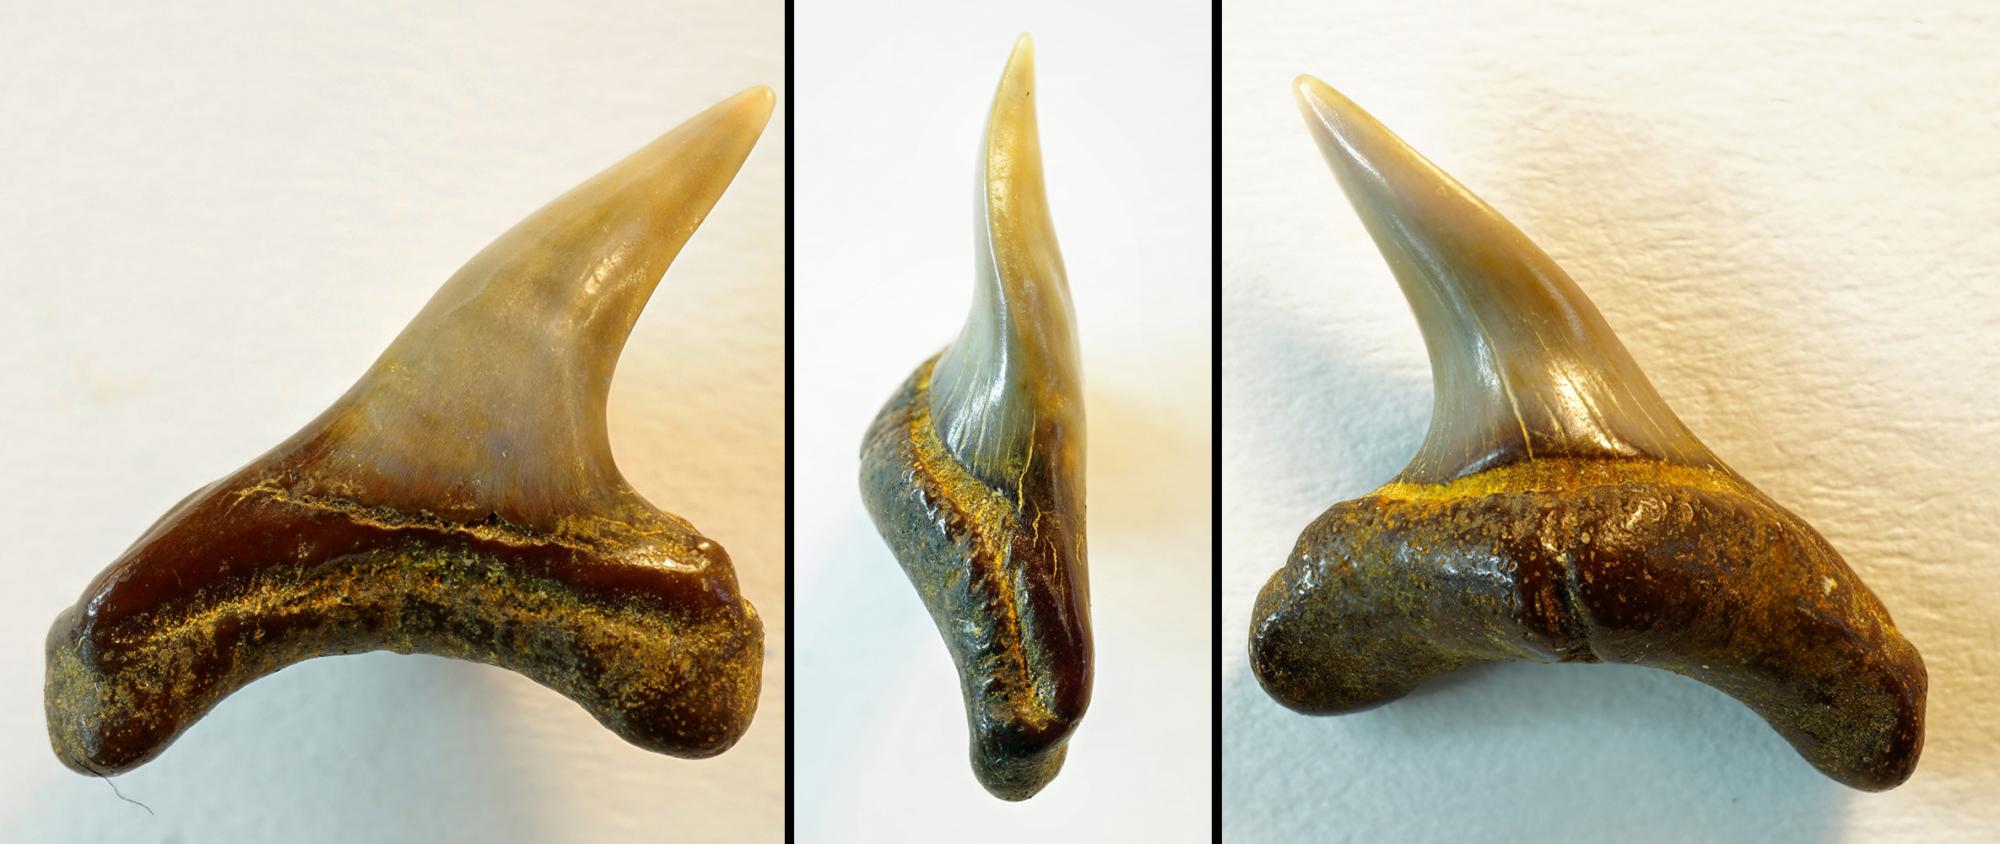 Alopias exigua, lateraler Zahn, Höch nähe Passau, Bayern, NHMW1990/1487/0188